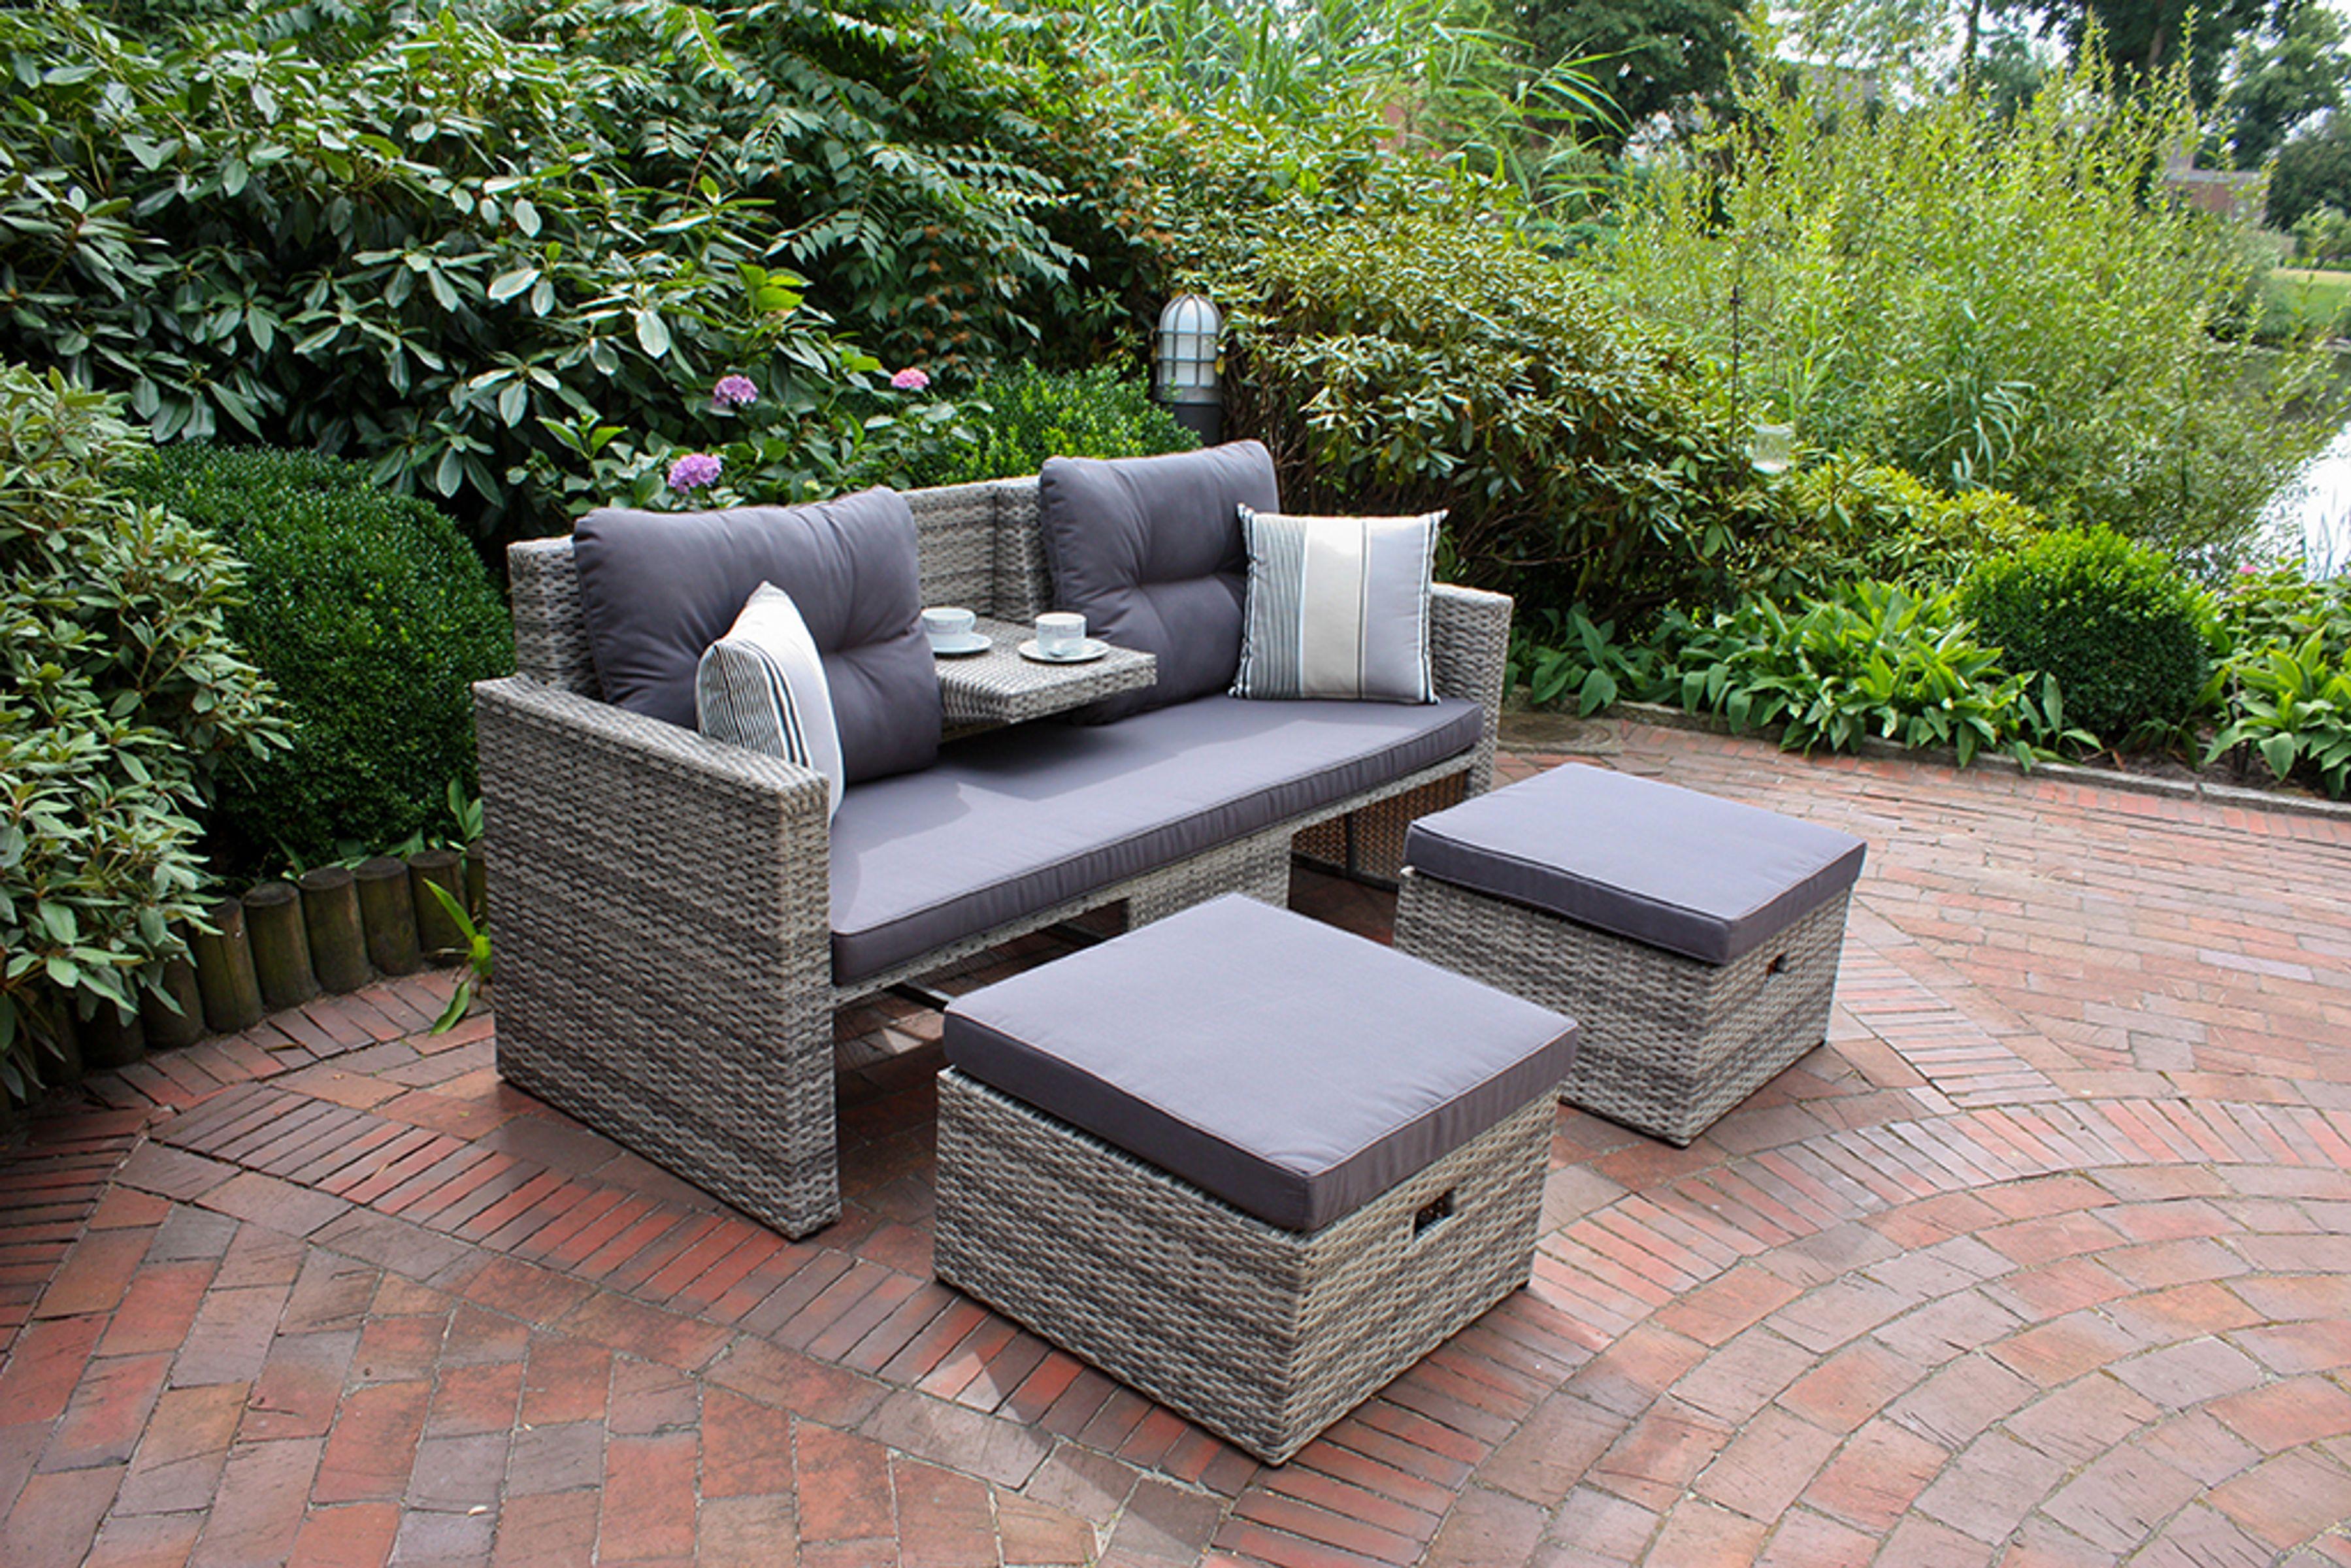 Lounge Sofa Gartensofa Sofa Couch Outdoor Garten Terrasse Inkl